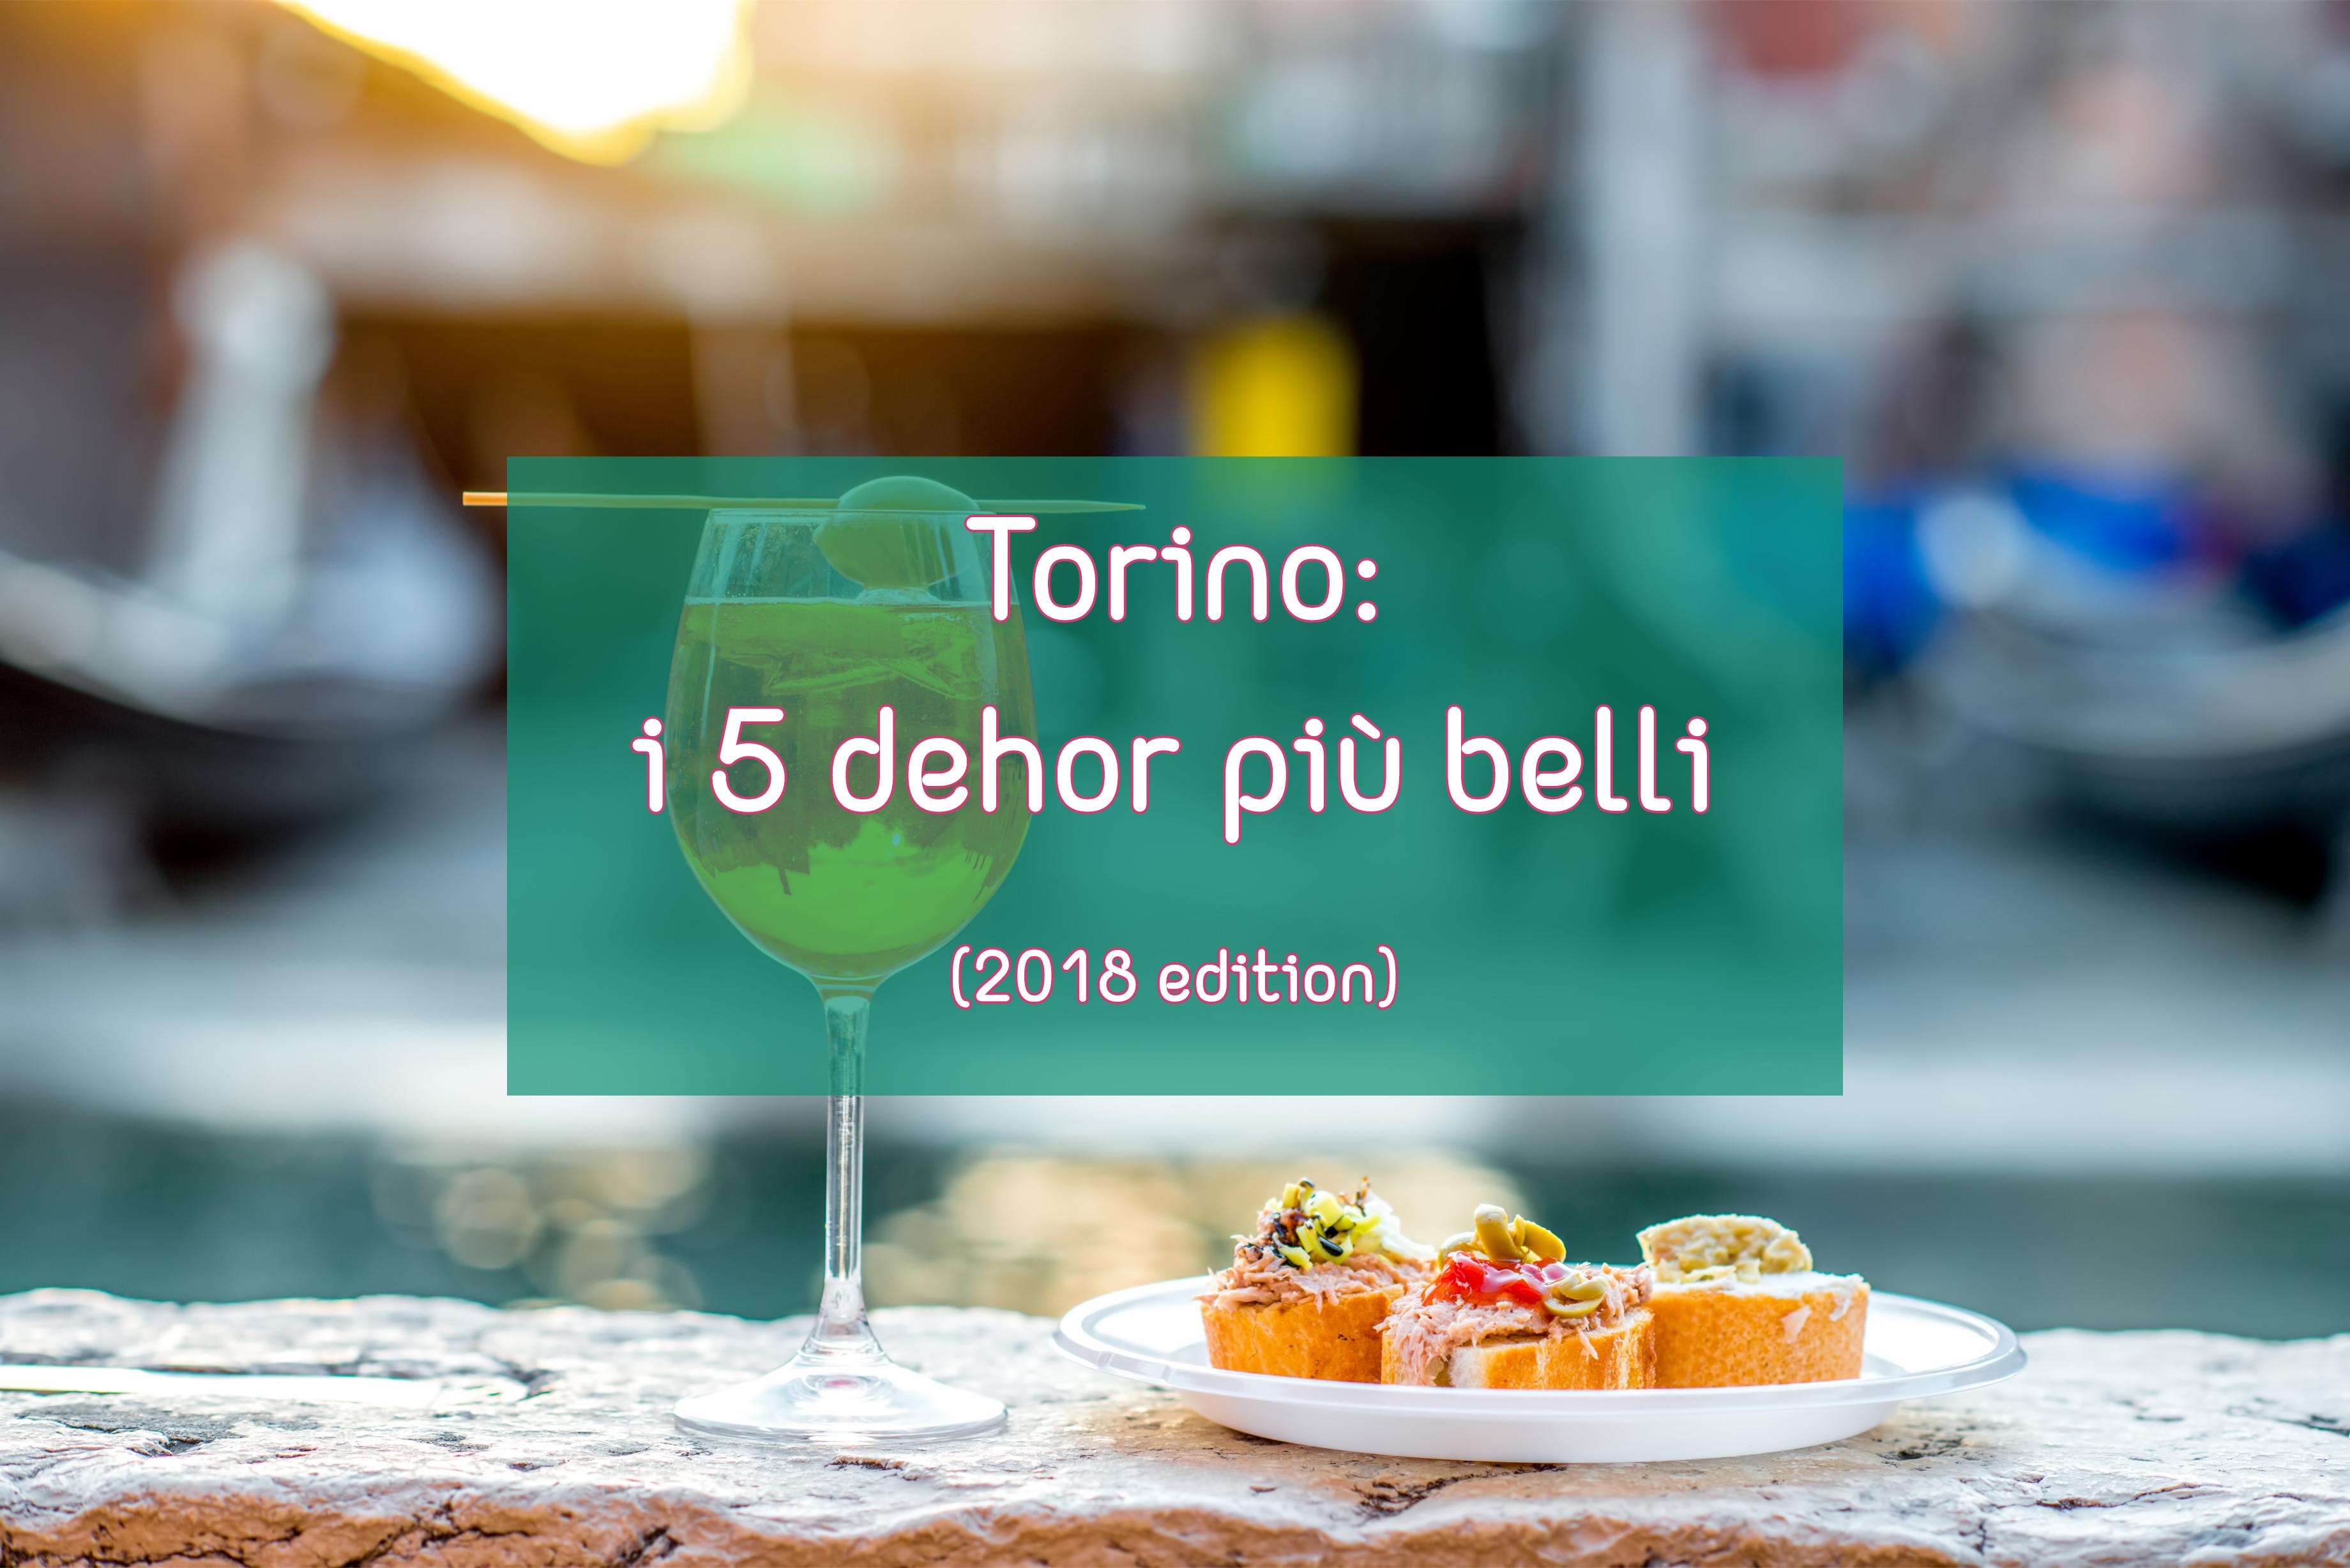 Torino: i 5 dehor più belli (2018 edition)